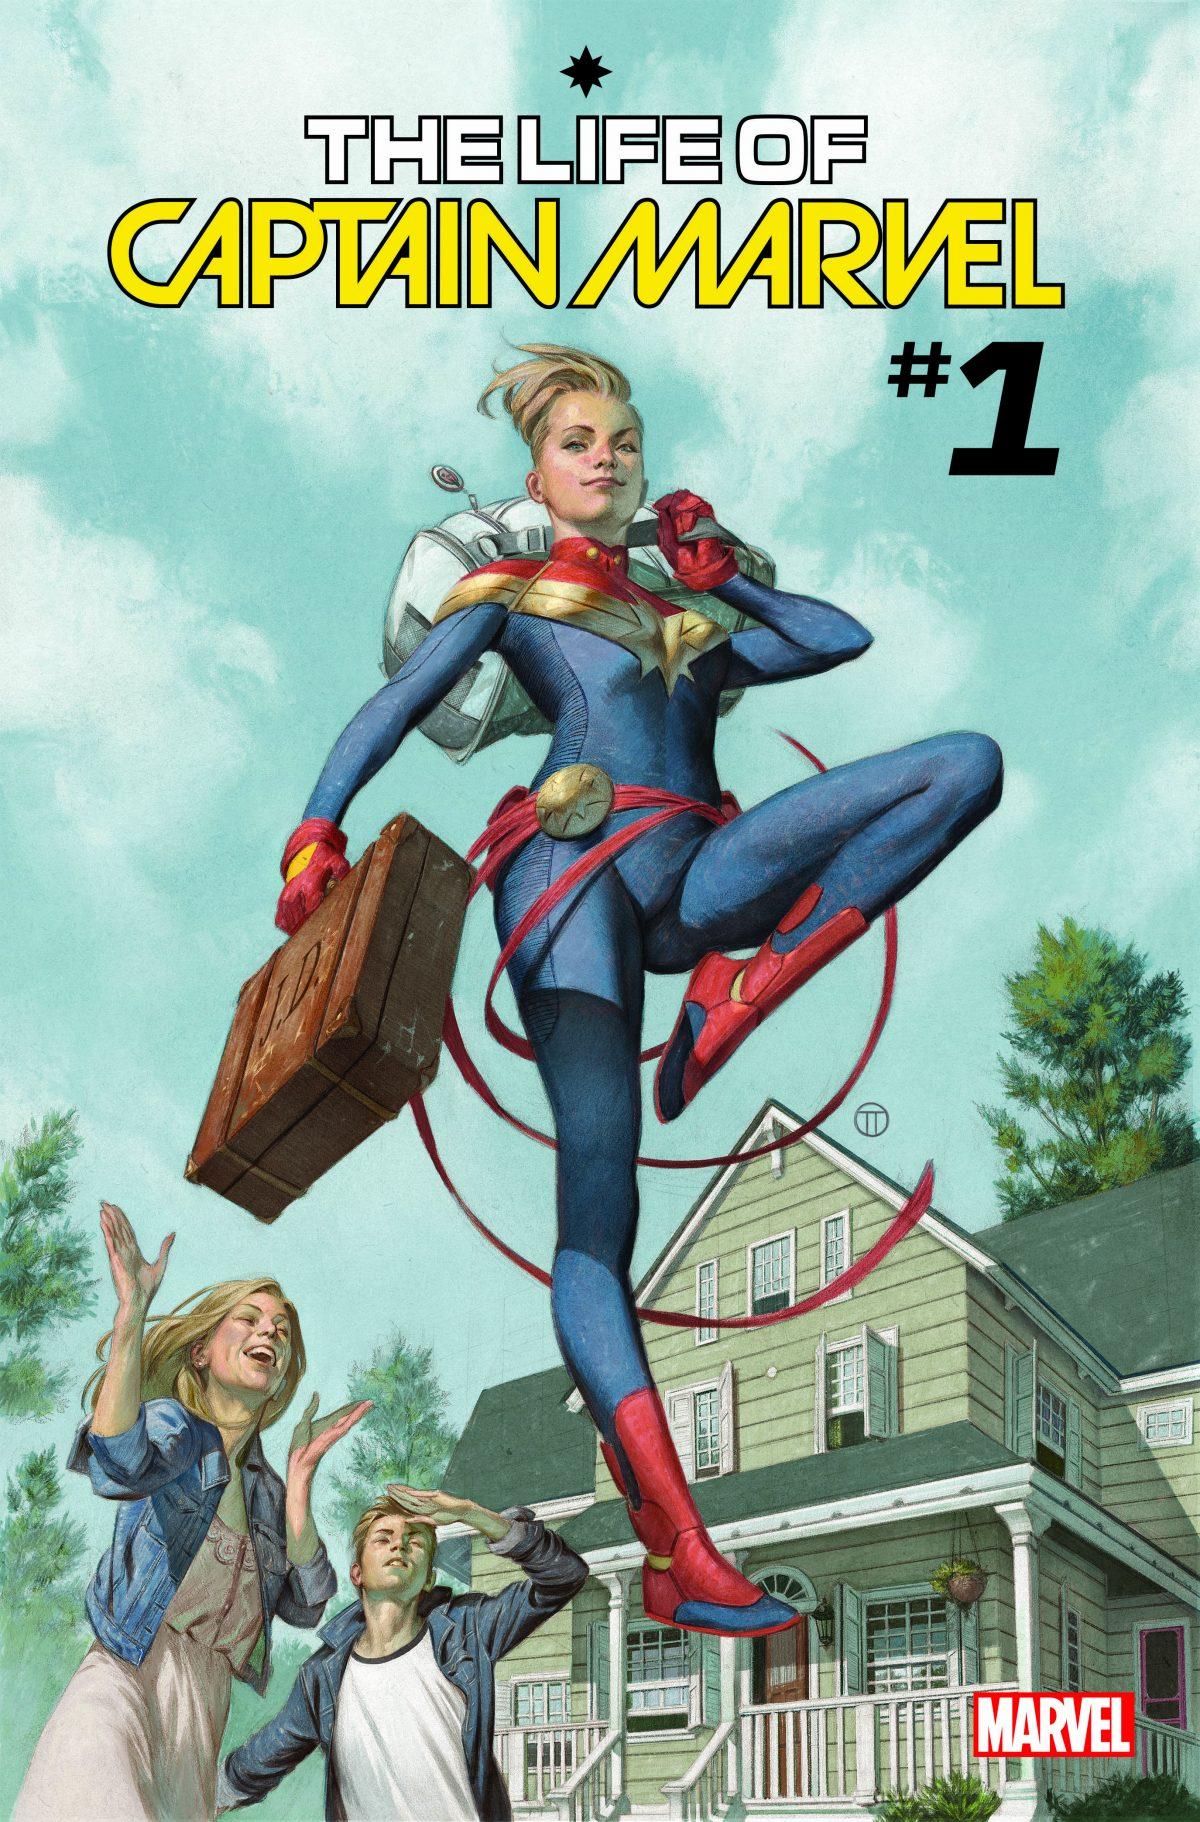 Marvel Announces The Life Of Captain Marvel 1